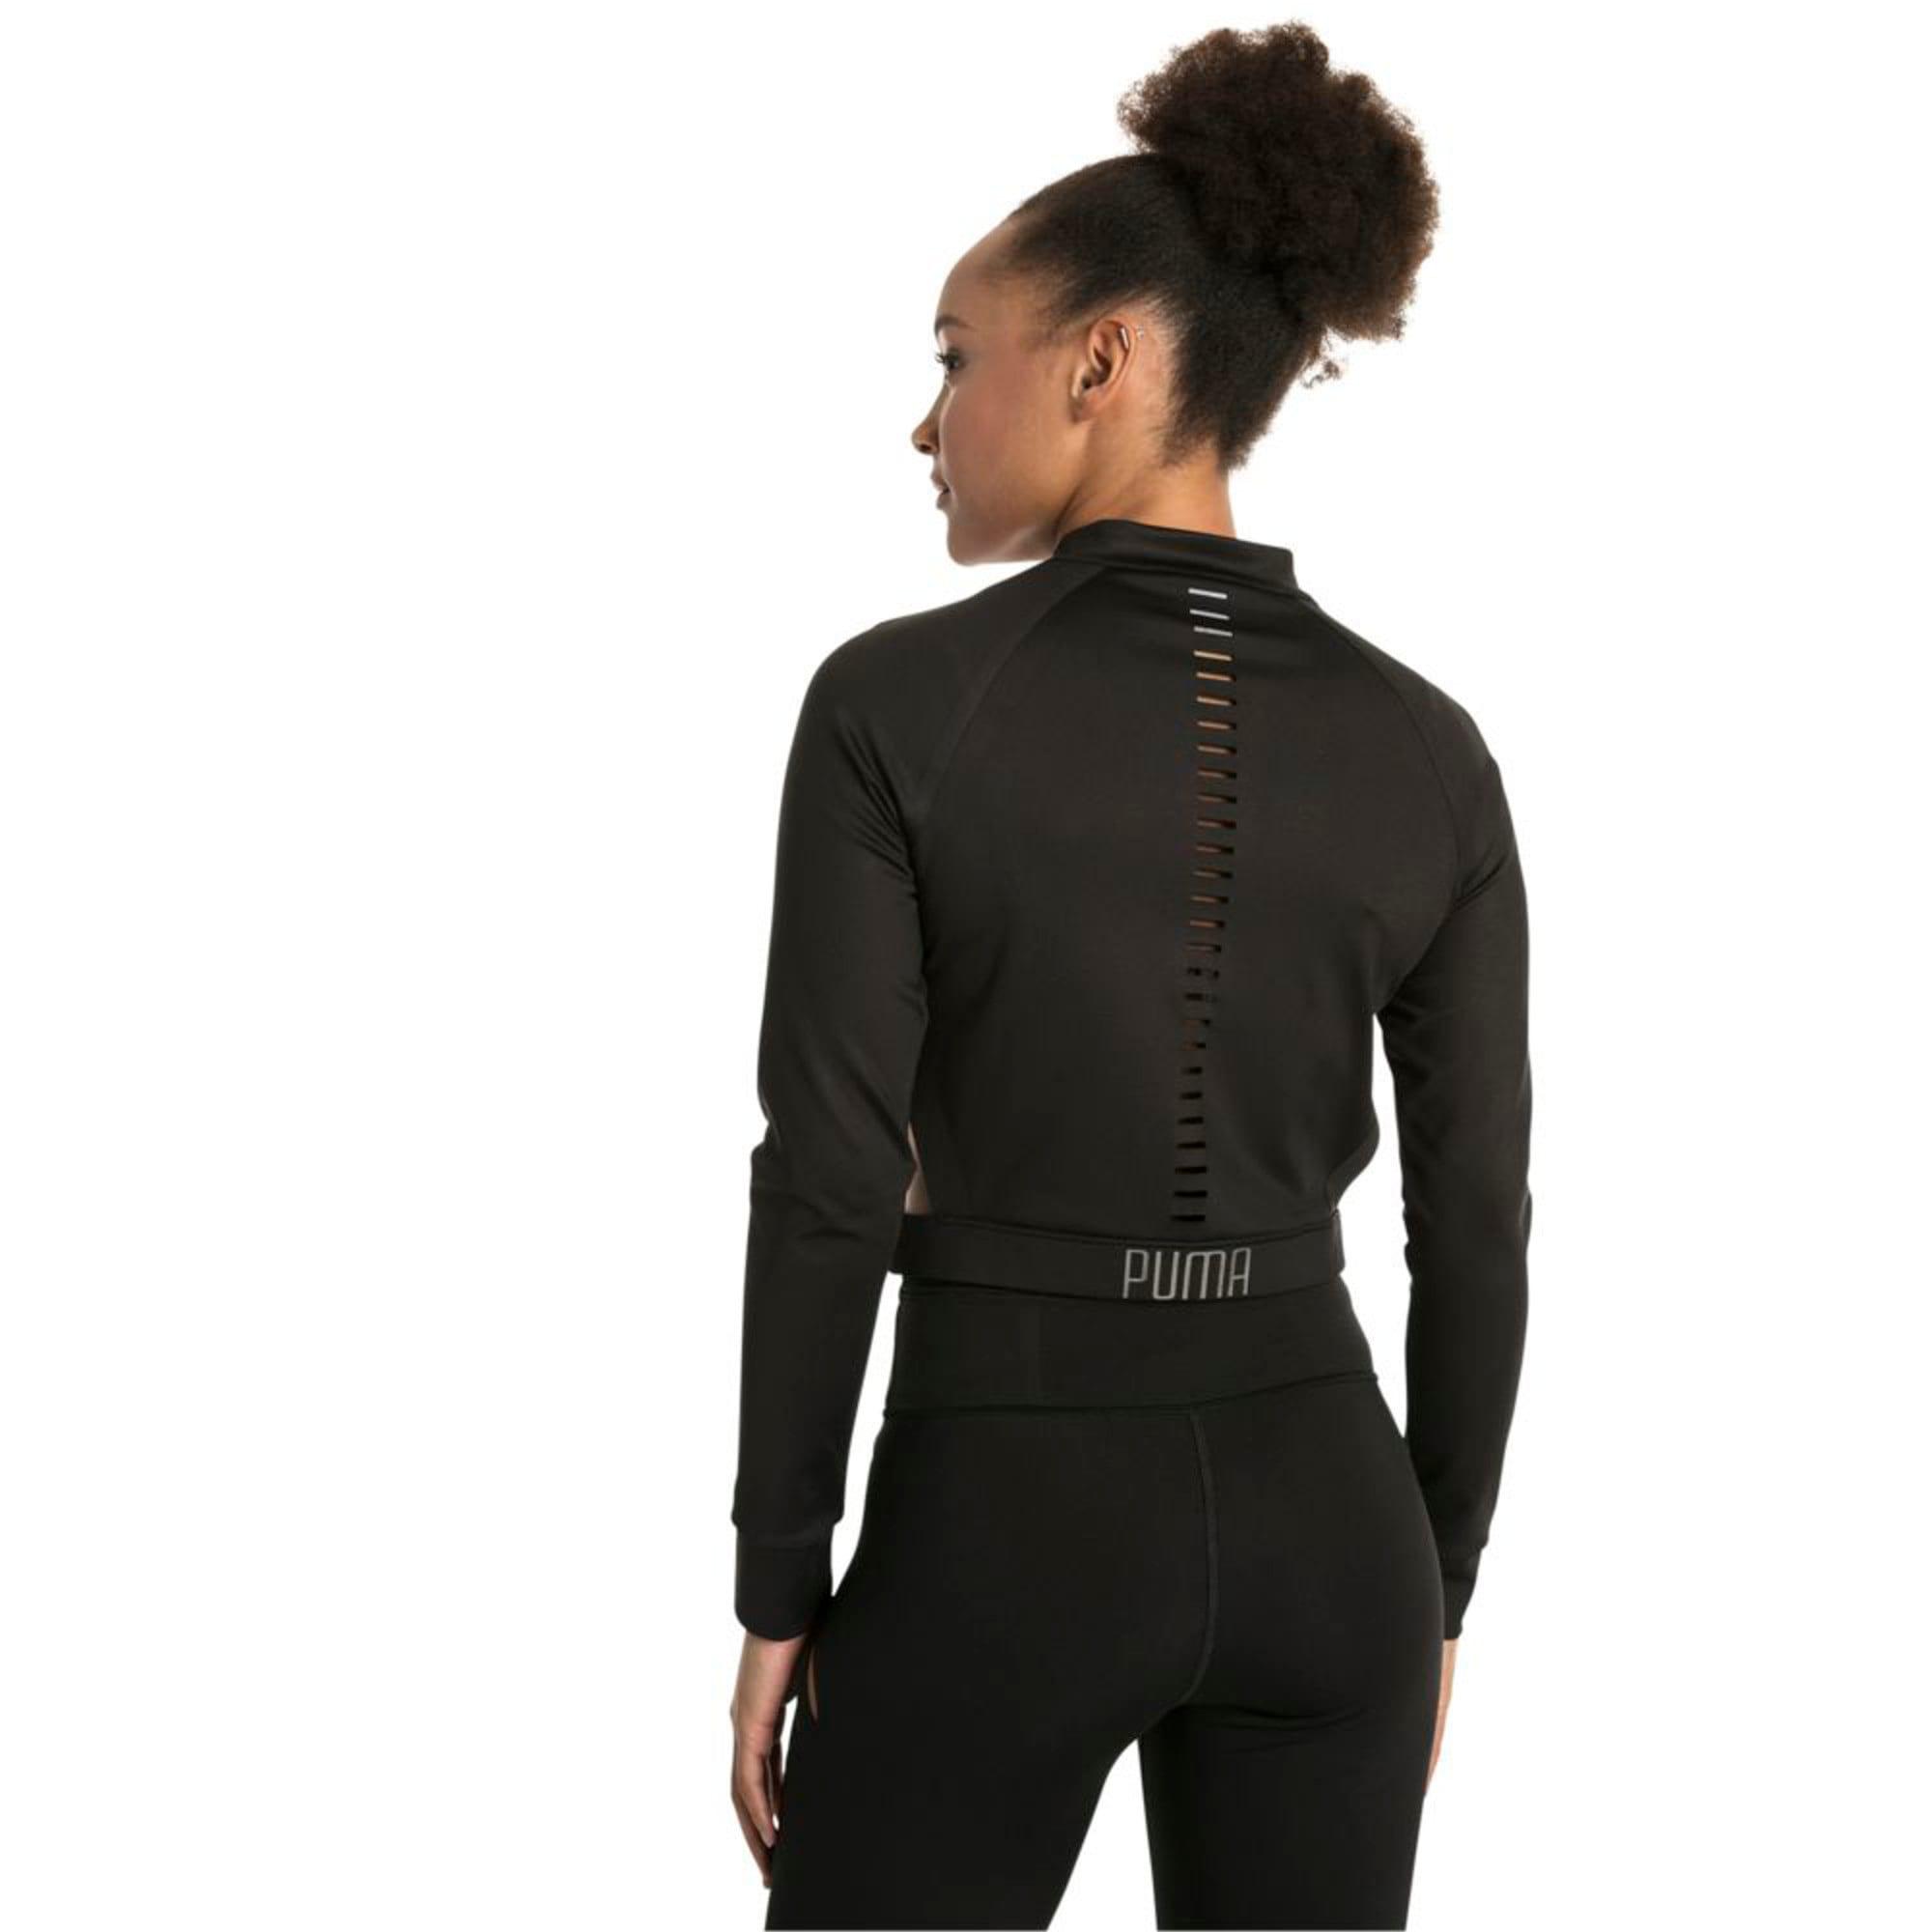 Thumbnail 6 of Explosive Cut-Out Women's Jacket, Puma Black, medium-IND